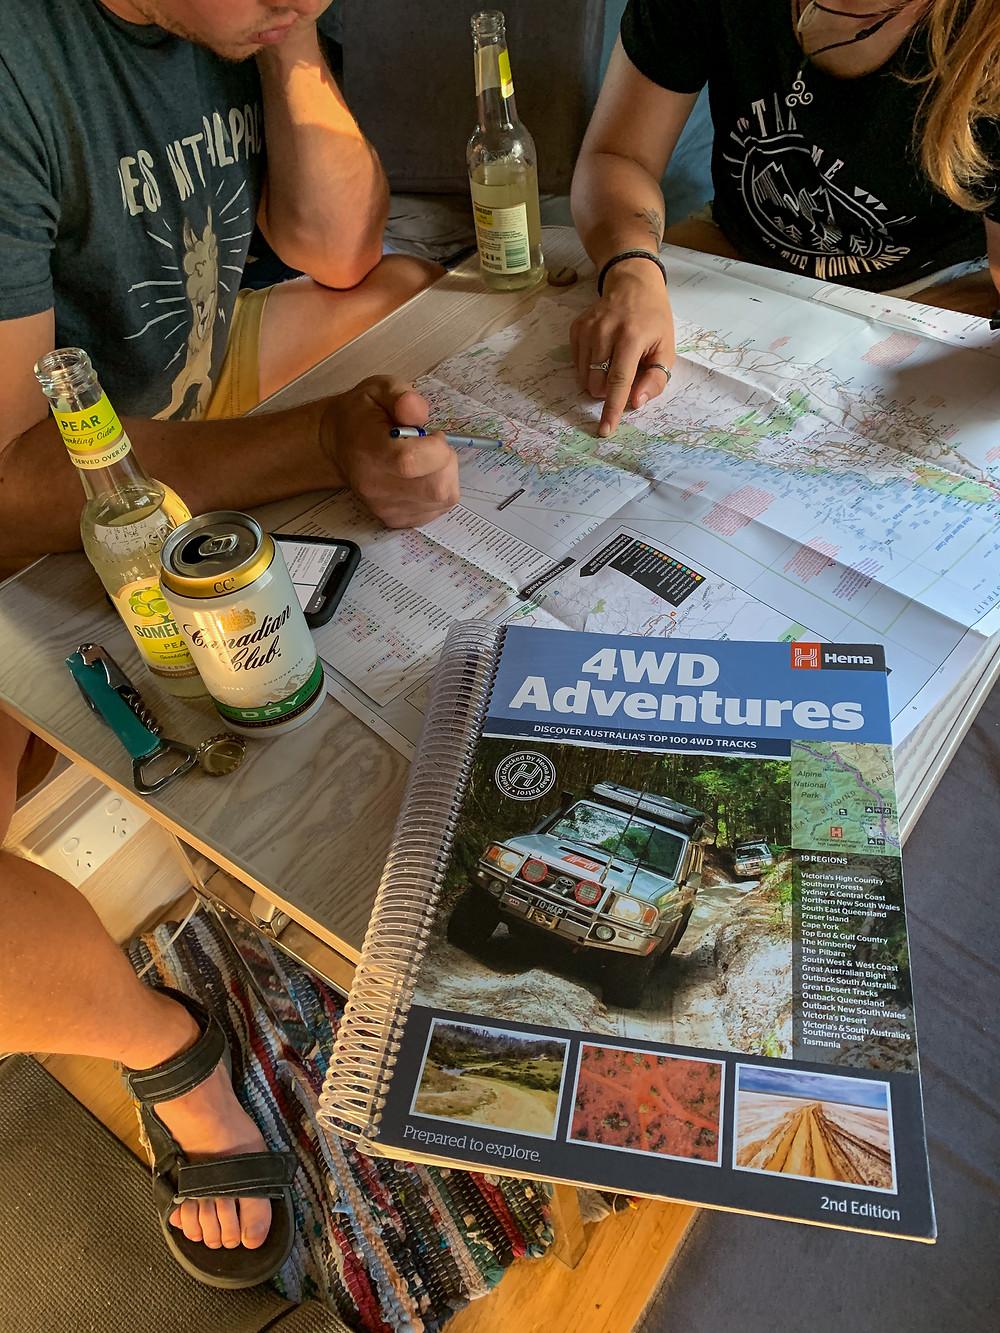 Hema 4WD book